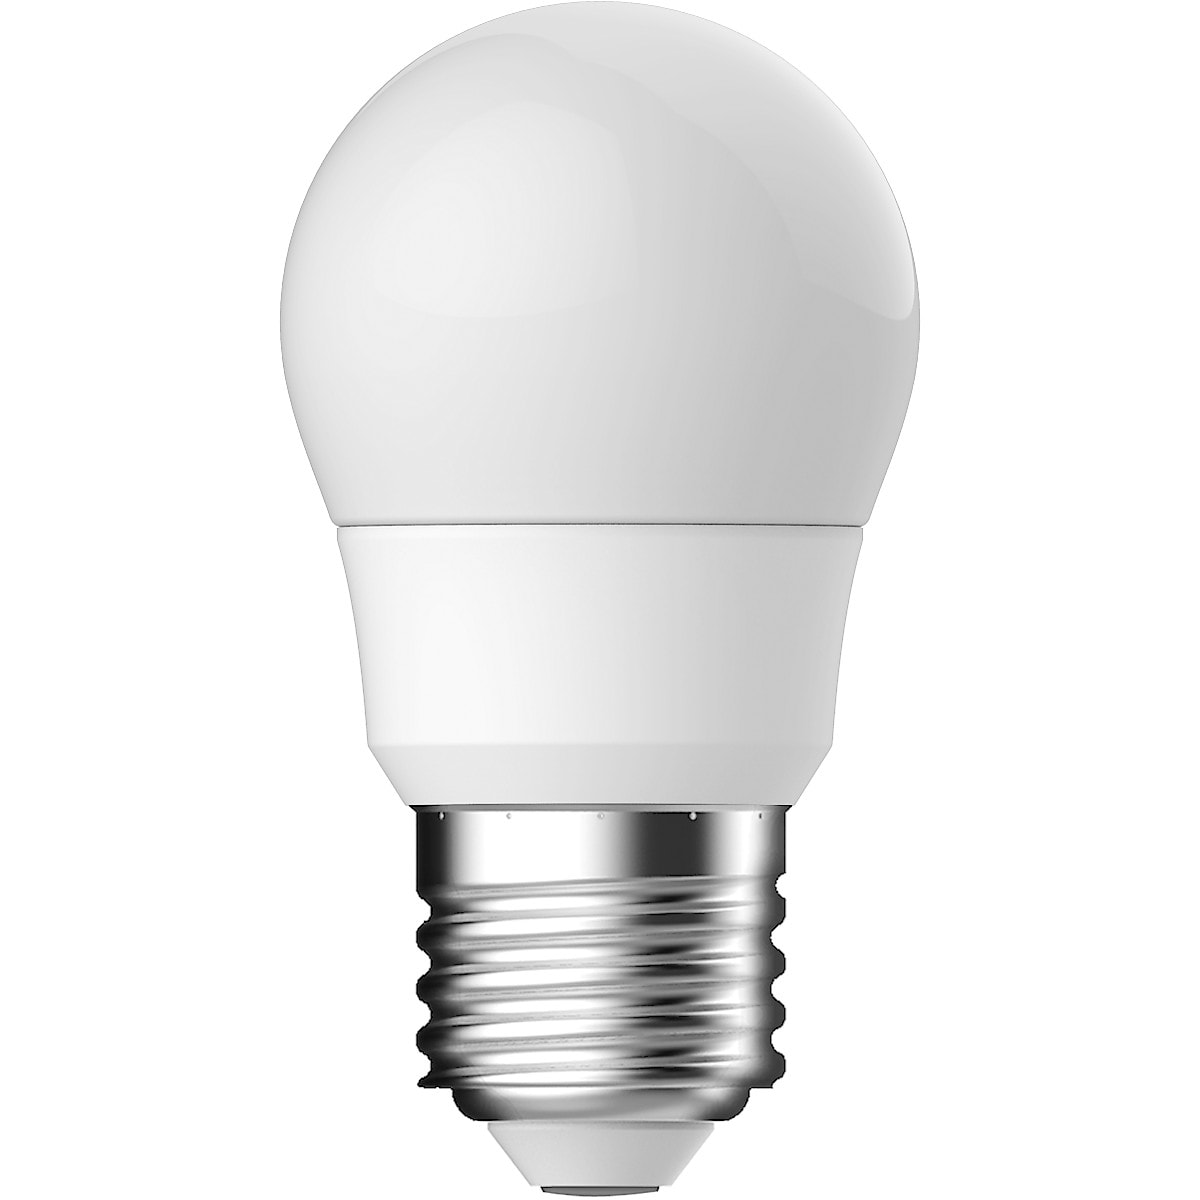 Pallolamppu LED kylmänvalkoinen E27 Clas Ohlson